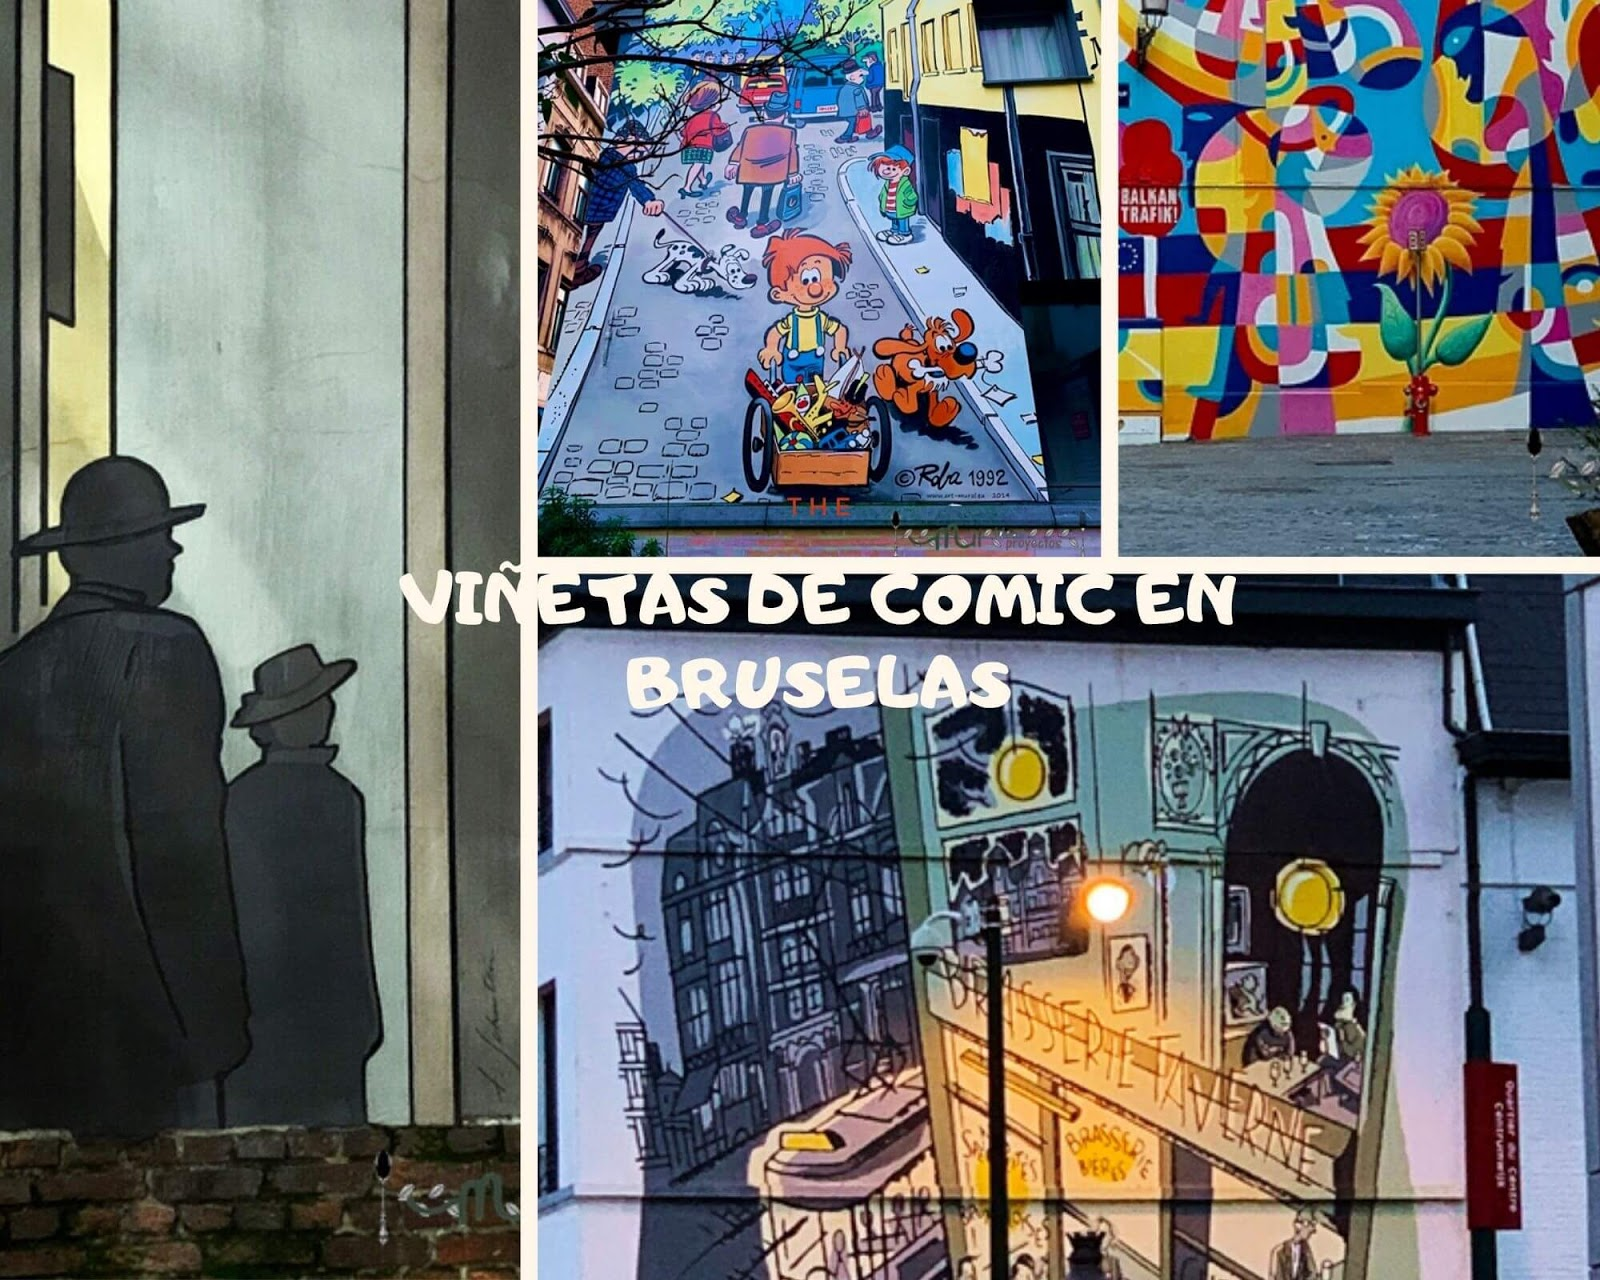 viñetas de comic en las fachadas de Bruselas